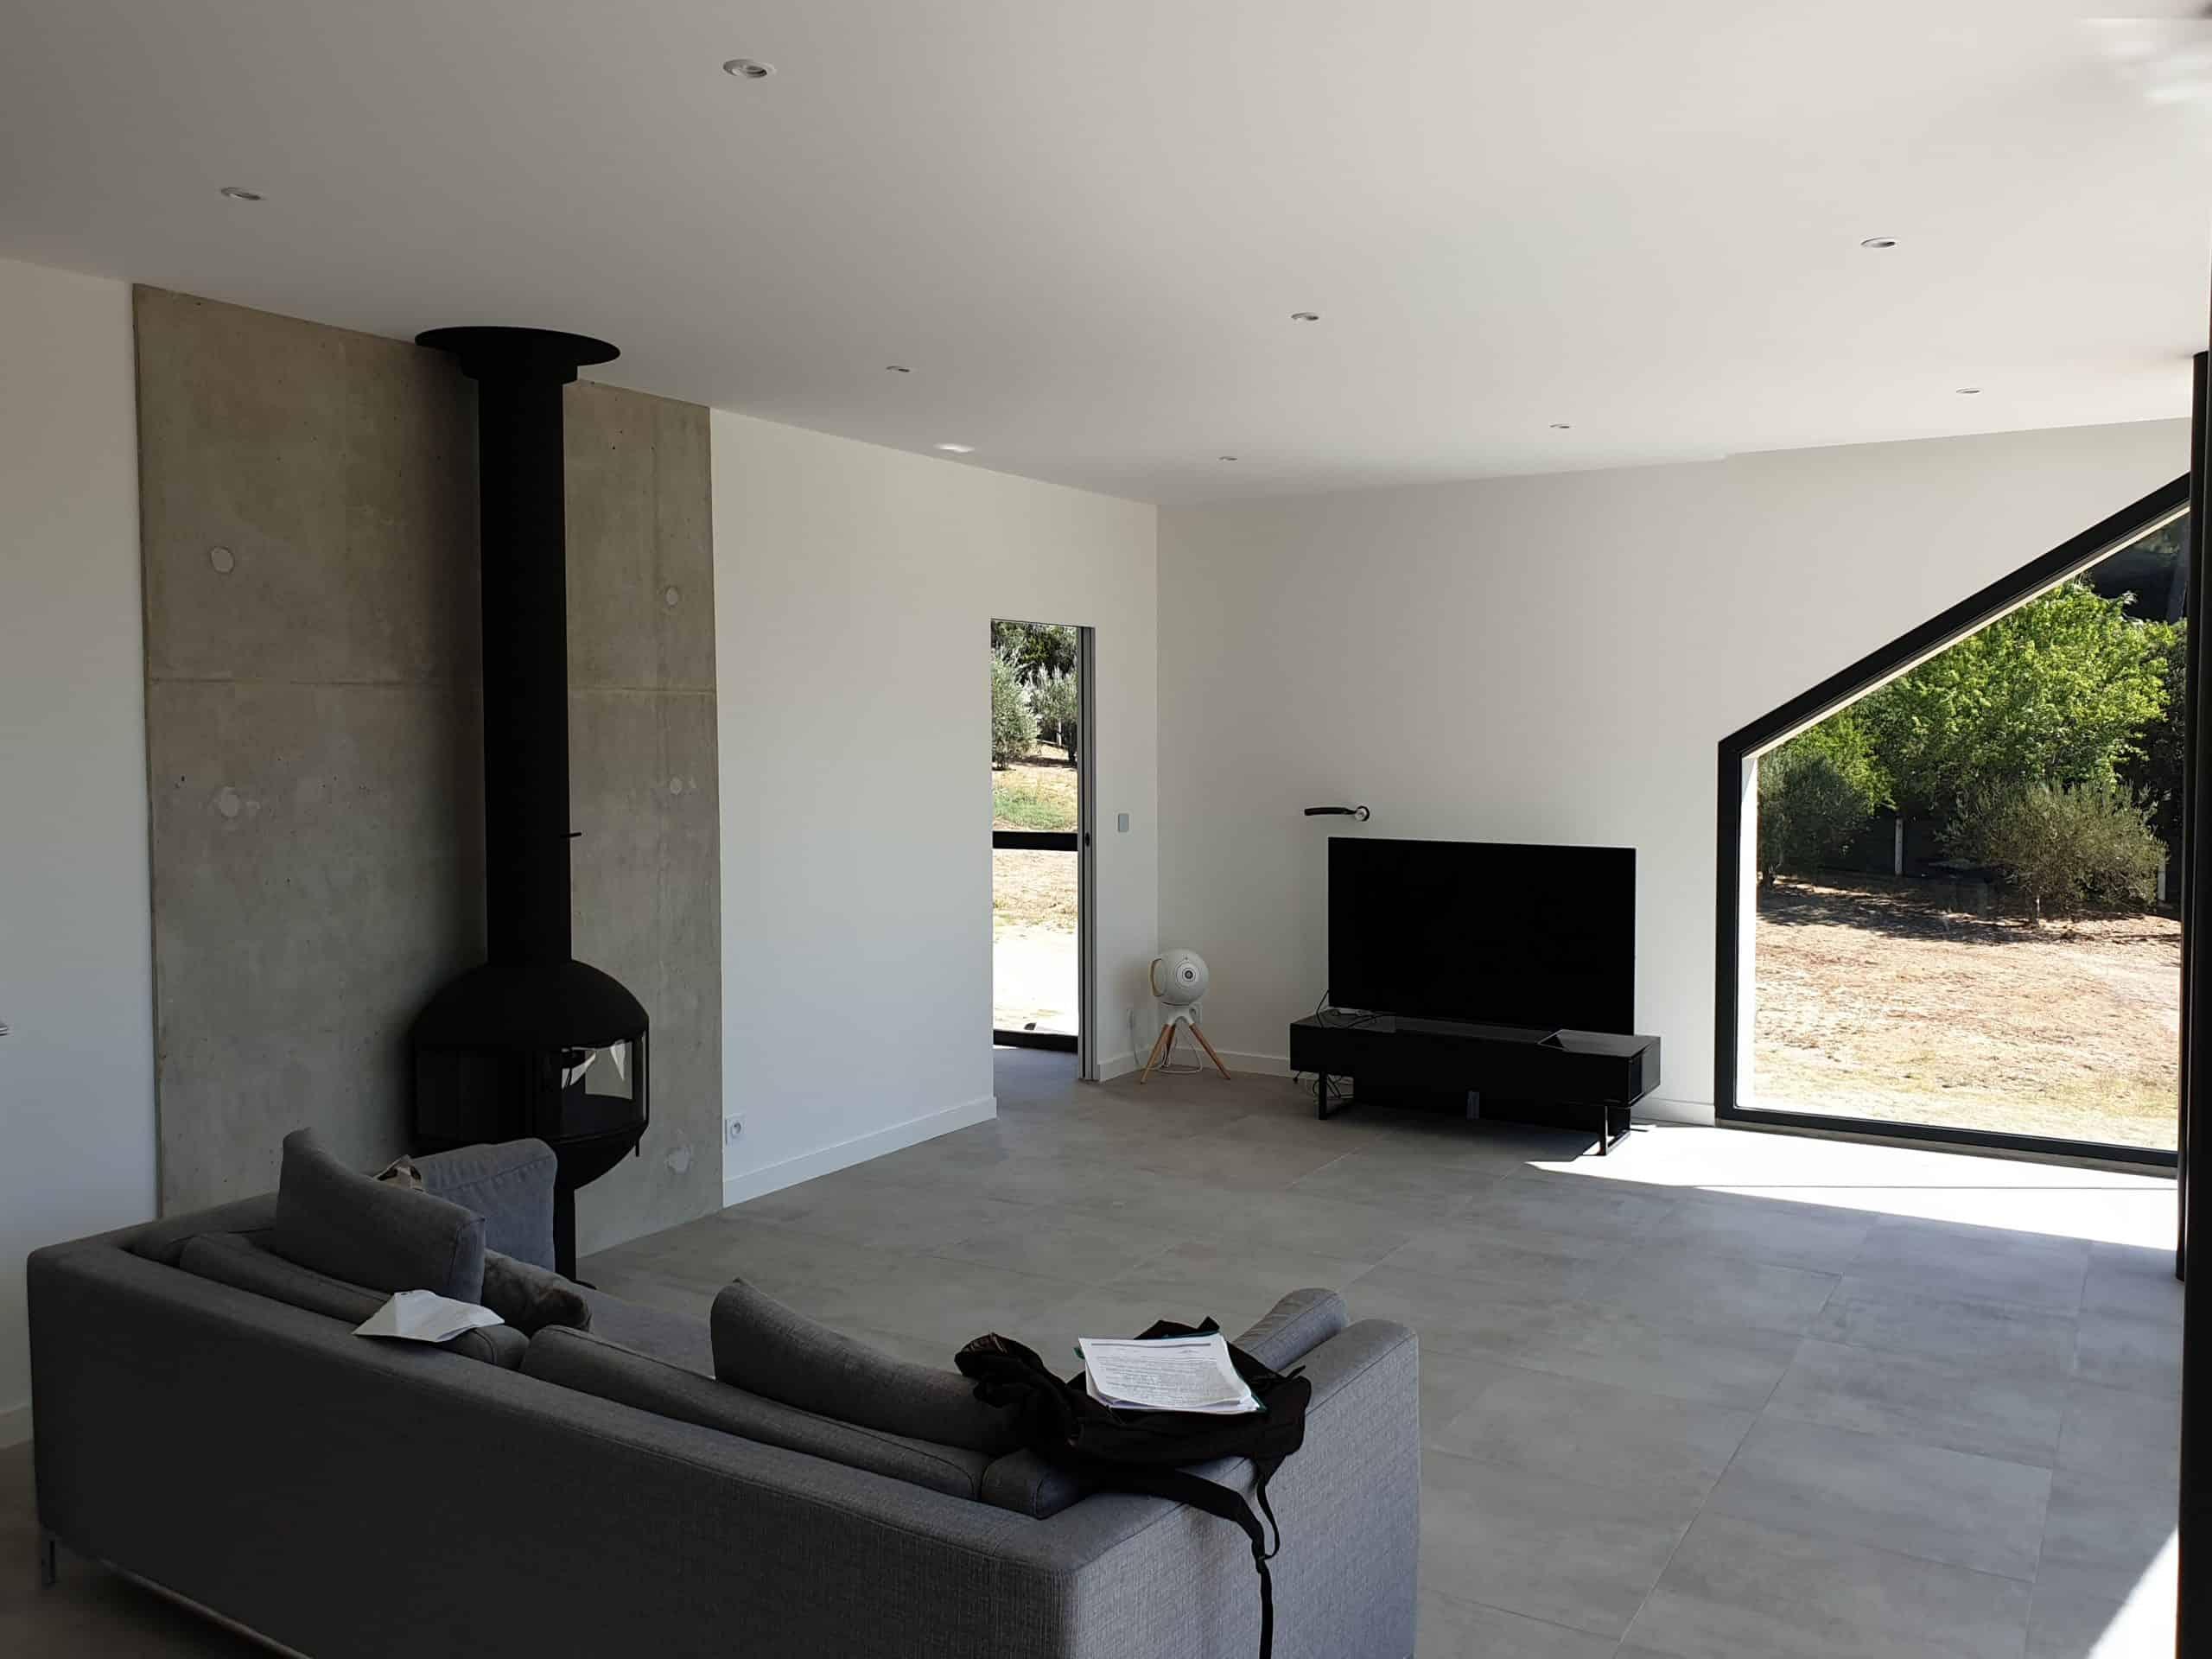 guillaume pepin architecte maison beton aubagne batiment realisation_11